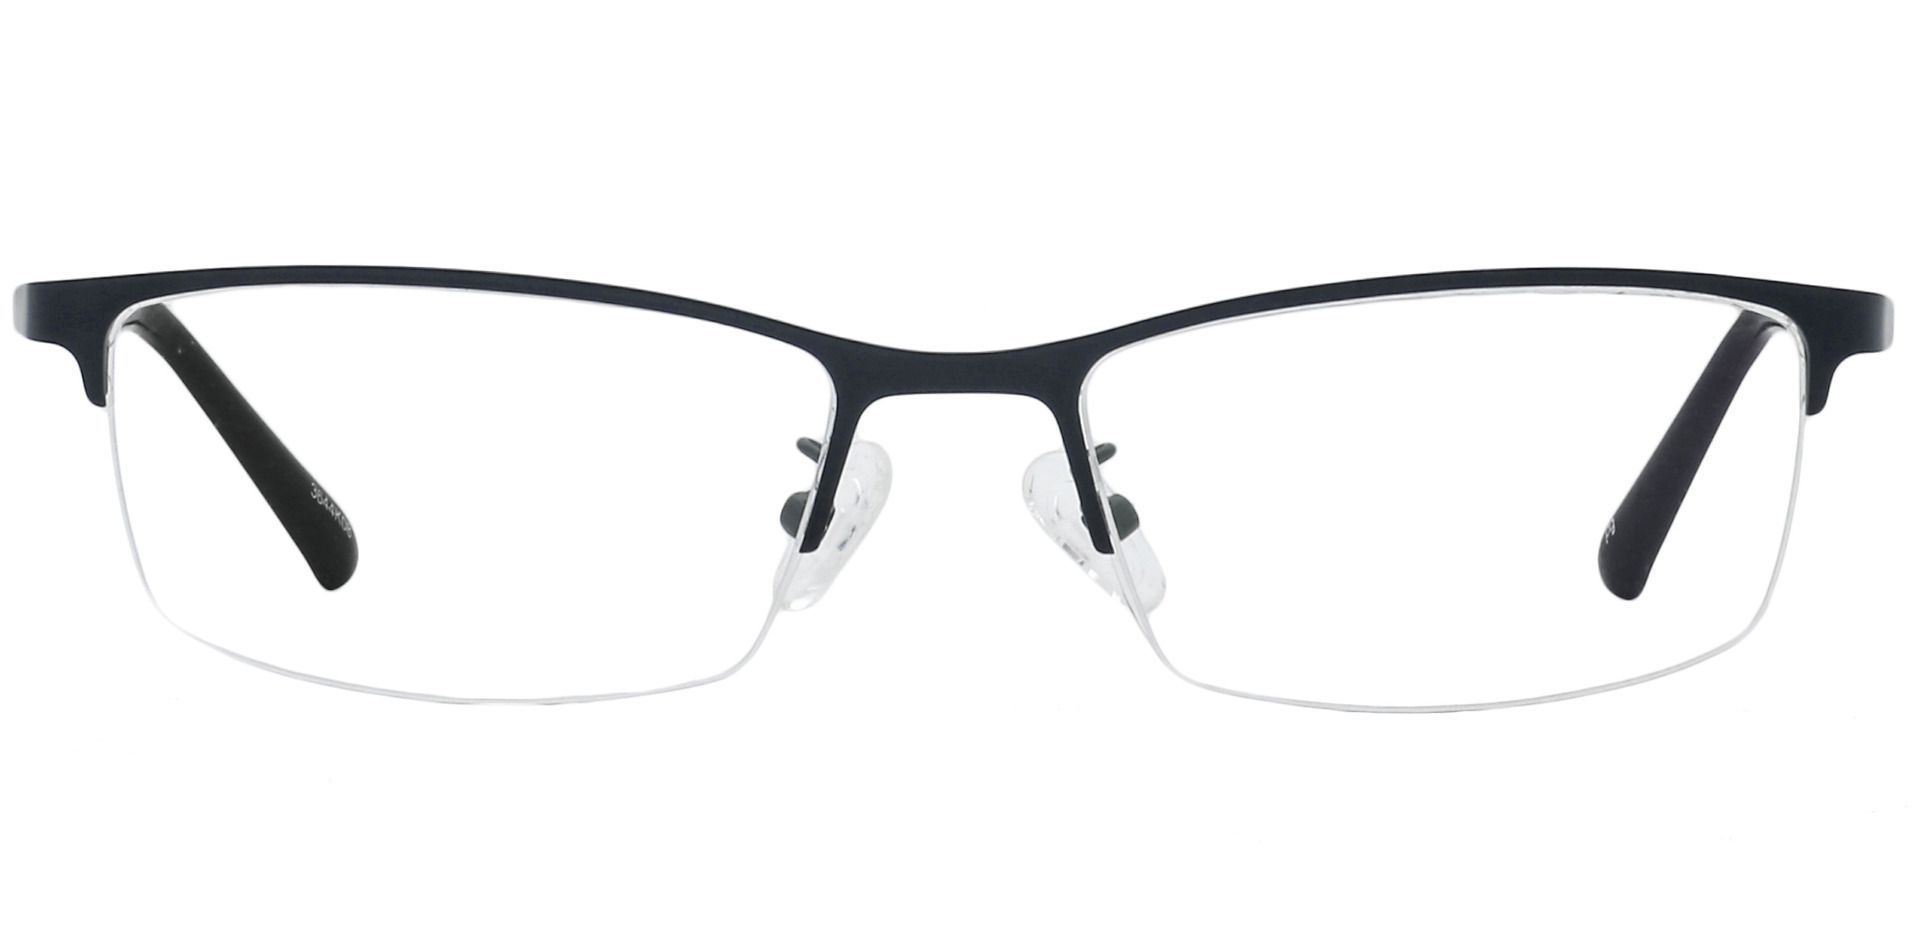 Parsley Rectangle Prescription Glasses - Black